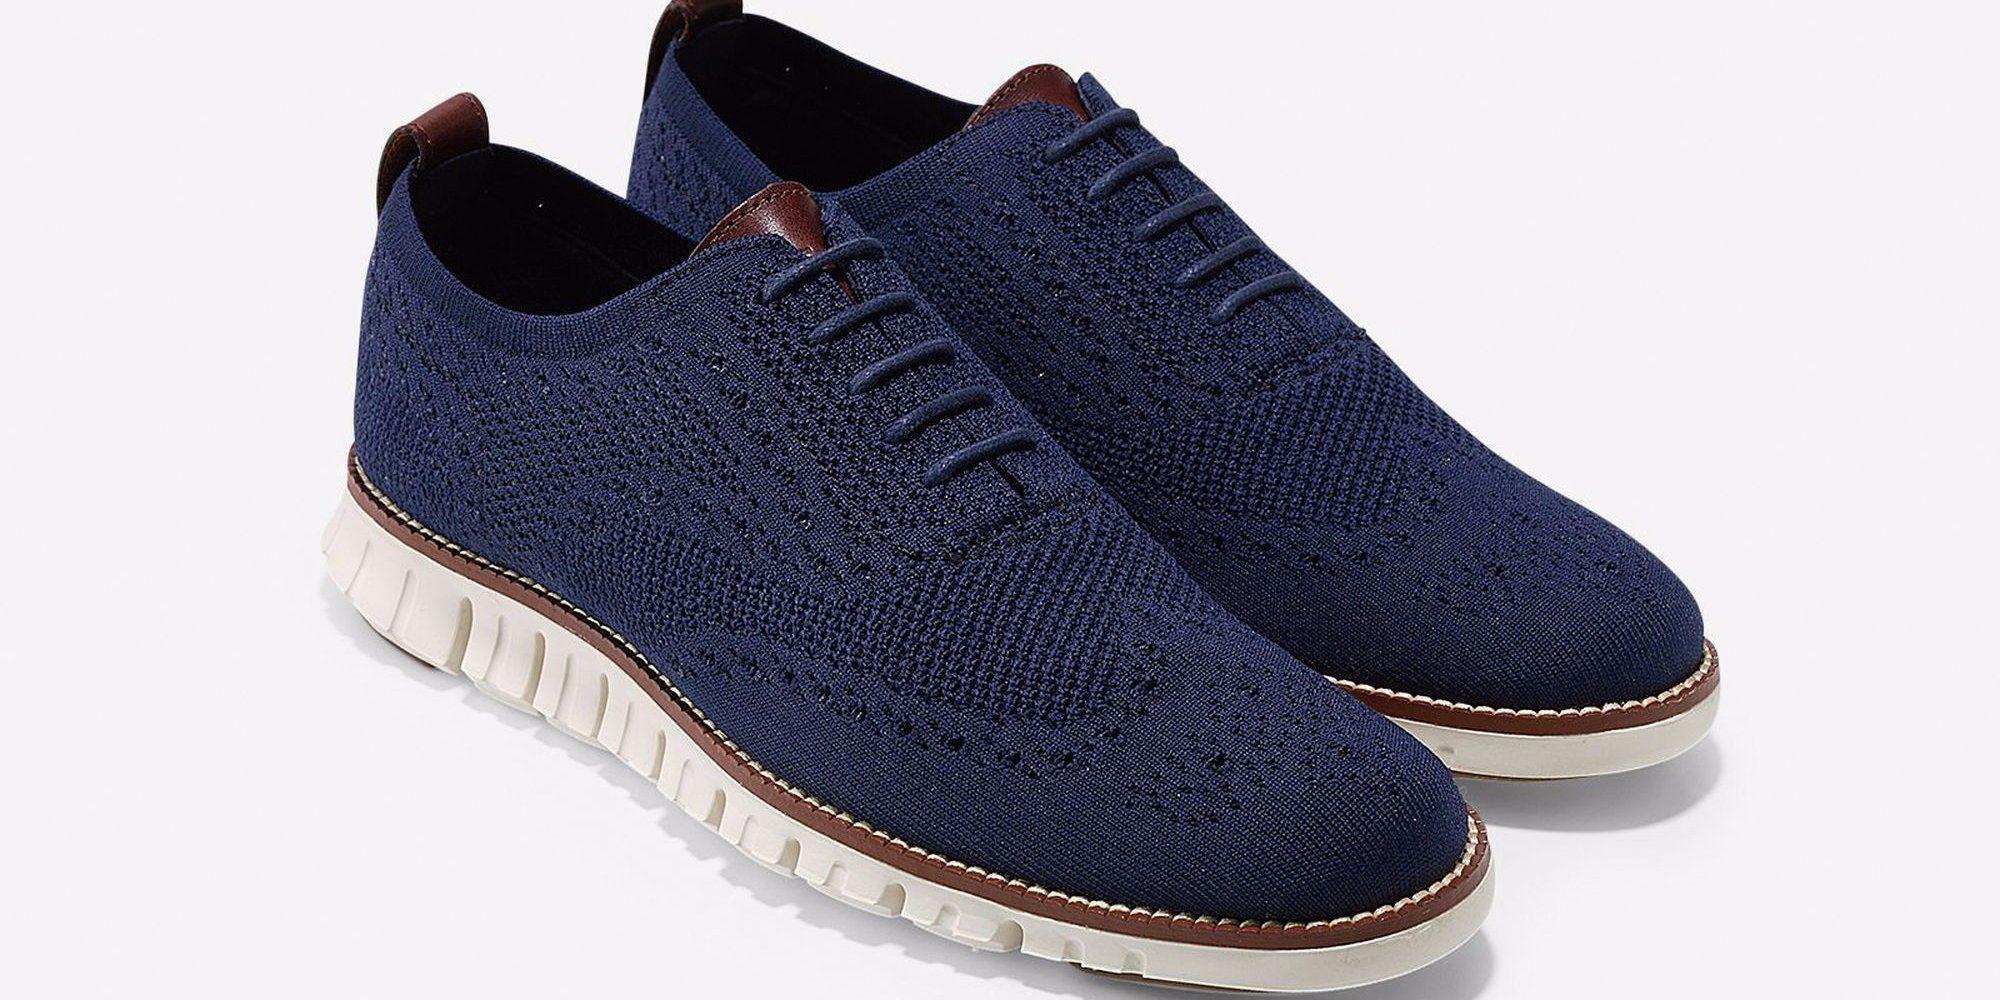 thumbnail footwear s a main shoes women browse comforter most shop comfortable dress men jos for bank clothiers